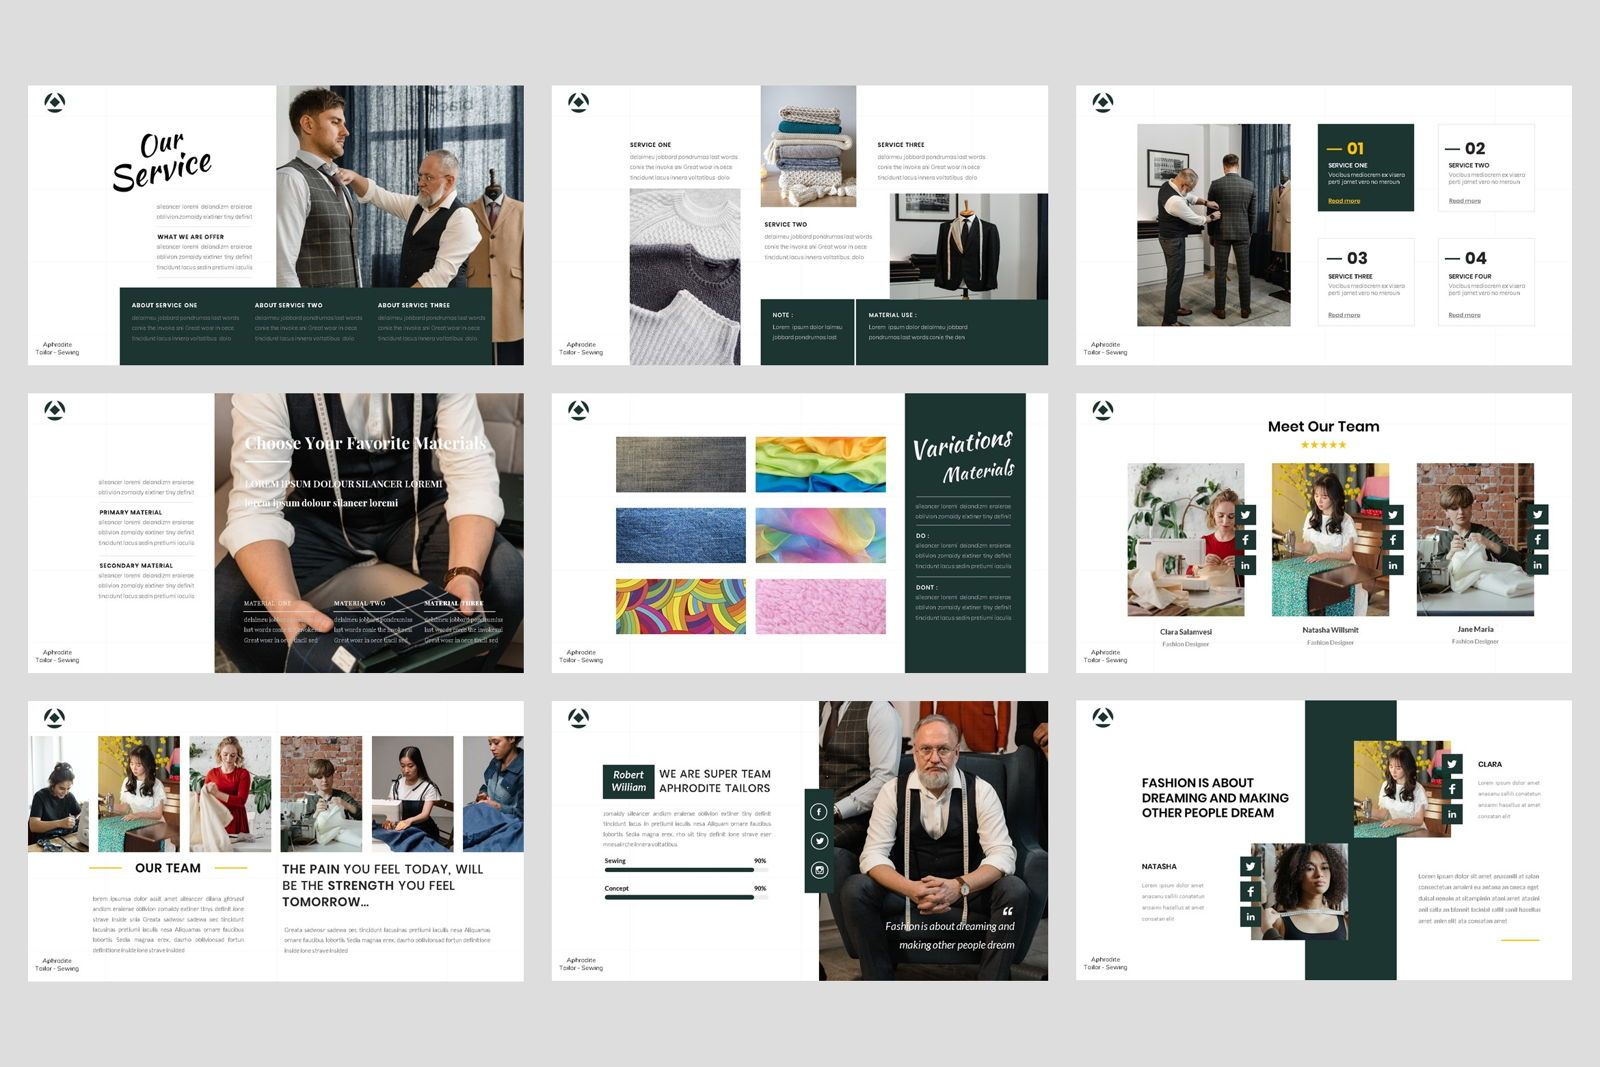 Tailor - Sewing Fashion Craft Google Slide Template, Slide 3, 08621, Business Models — PoweredTemplate.com